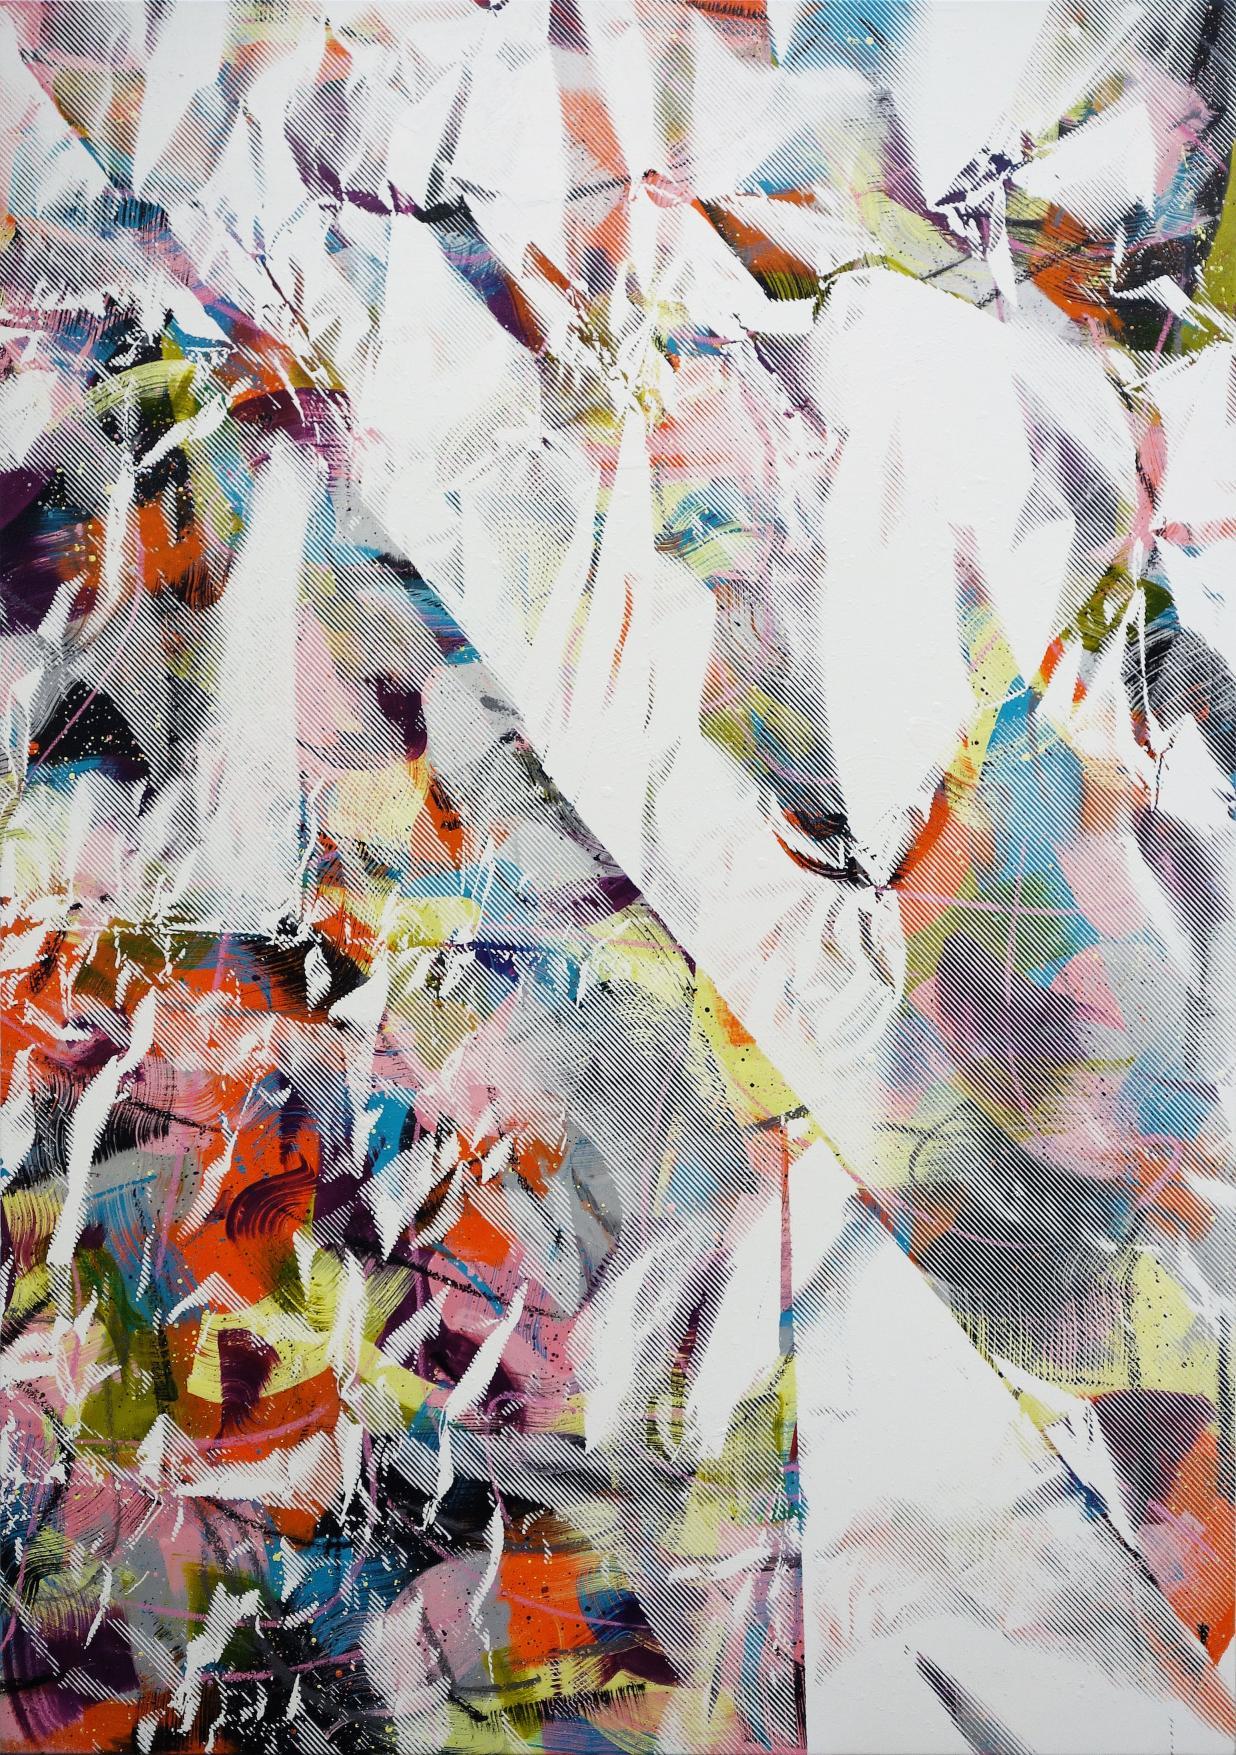 Muro #20 (2020) - Adrián Navarro